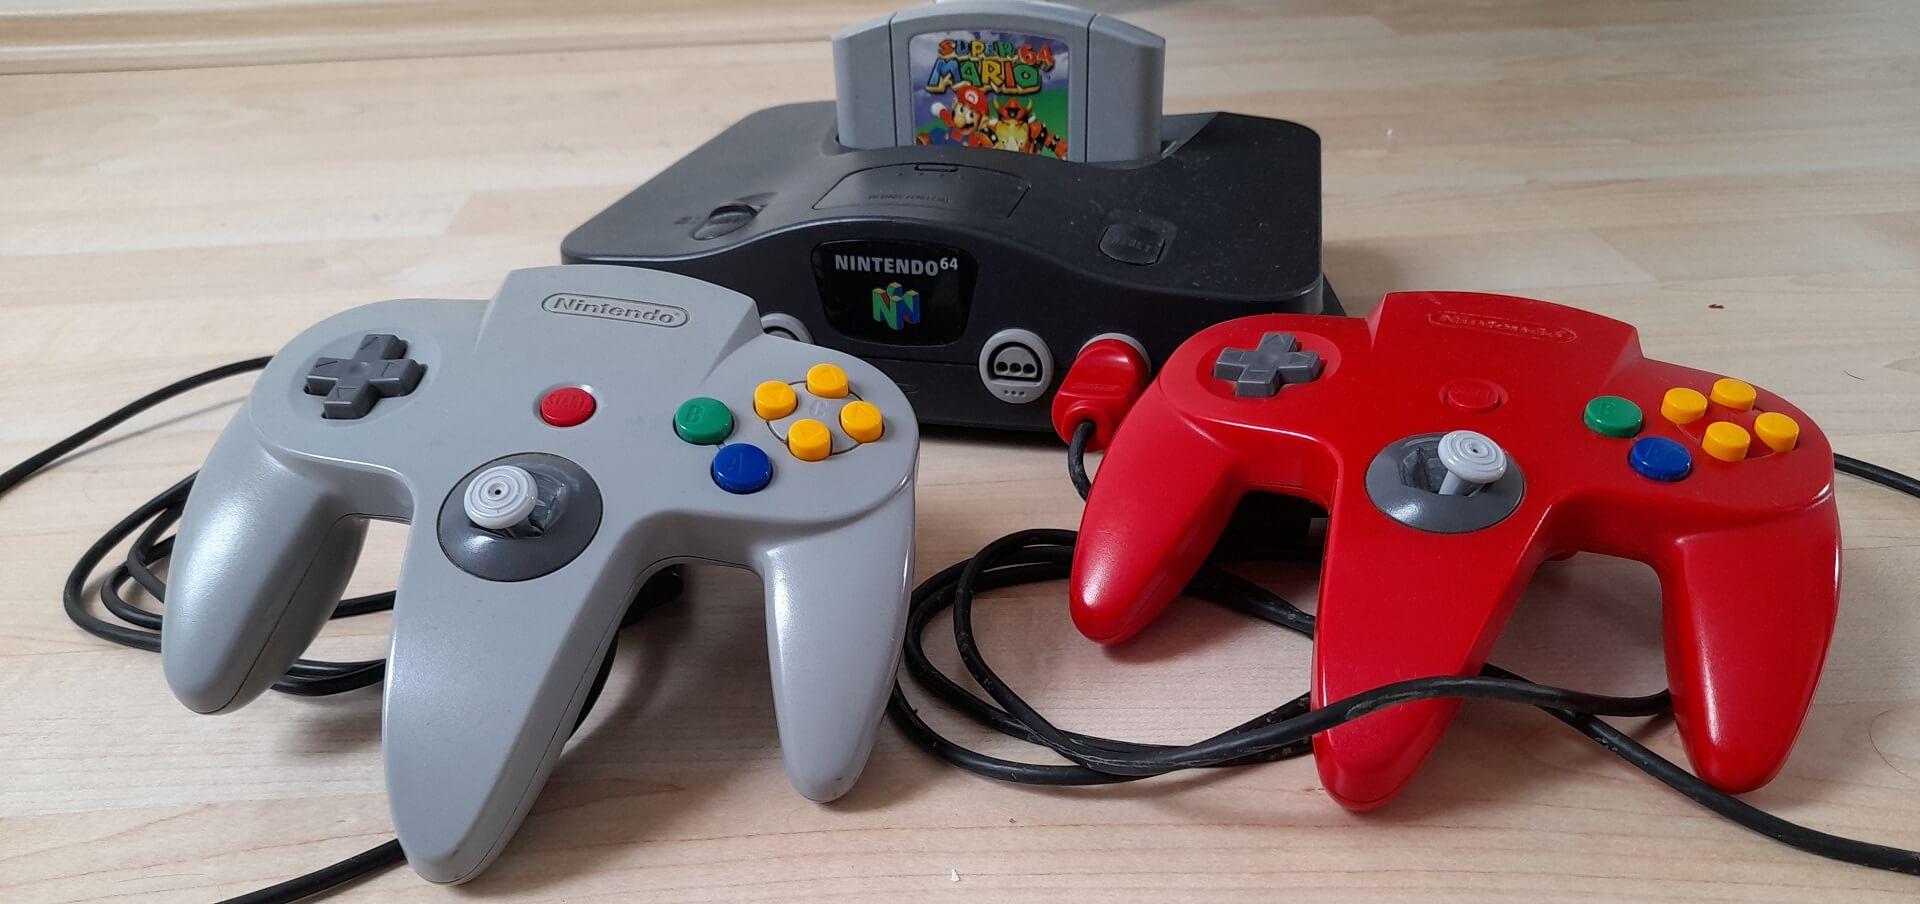 25 Jahre Nintendo 64